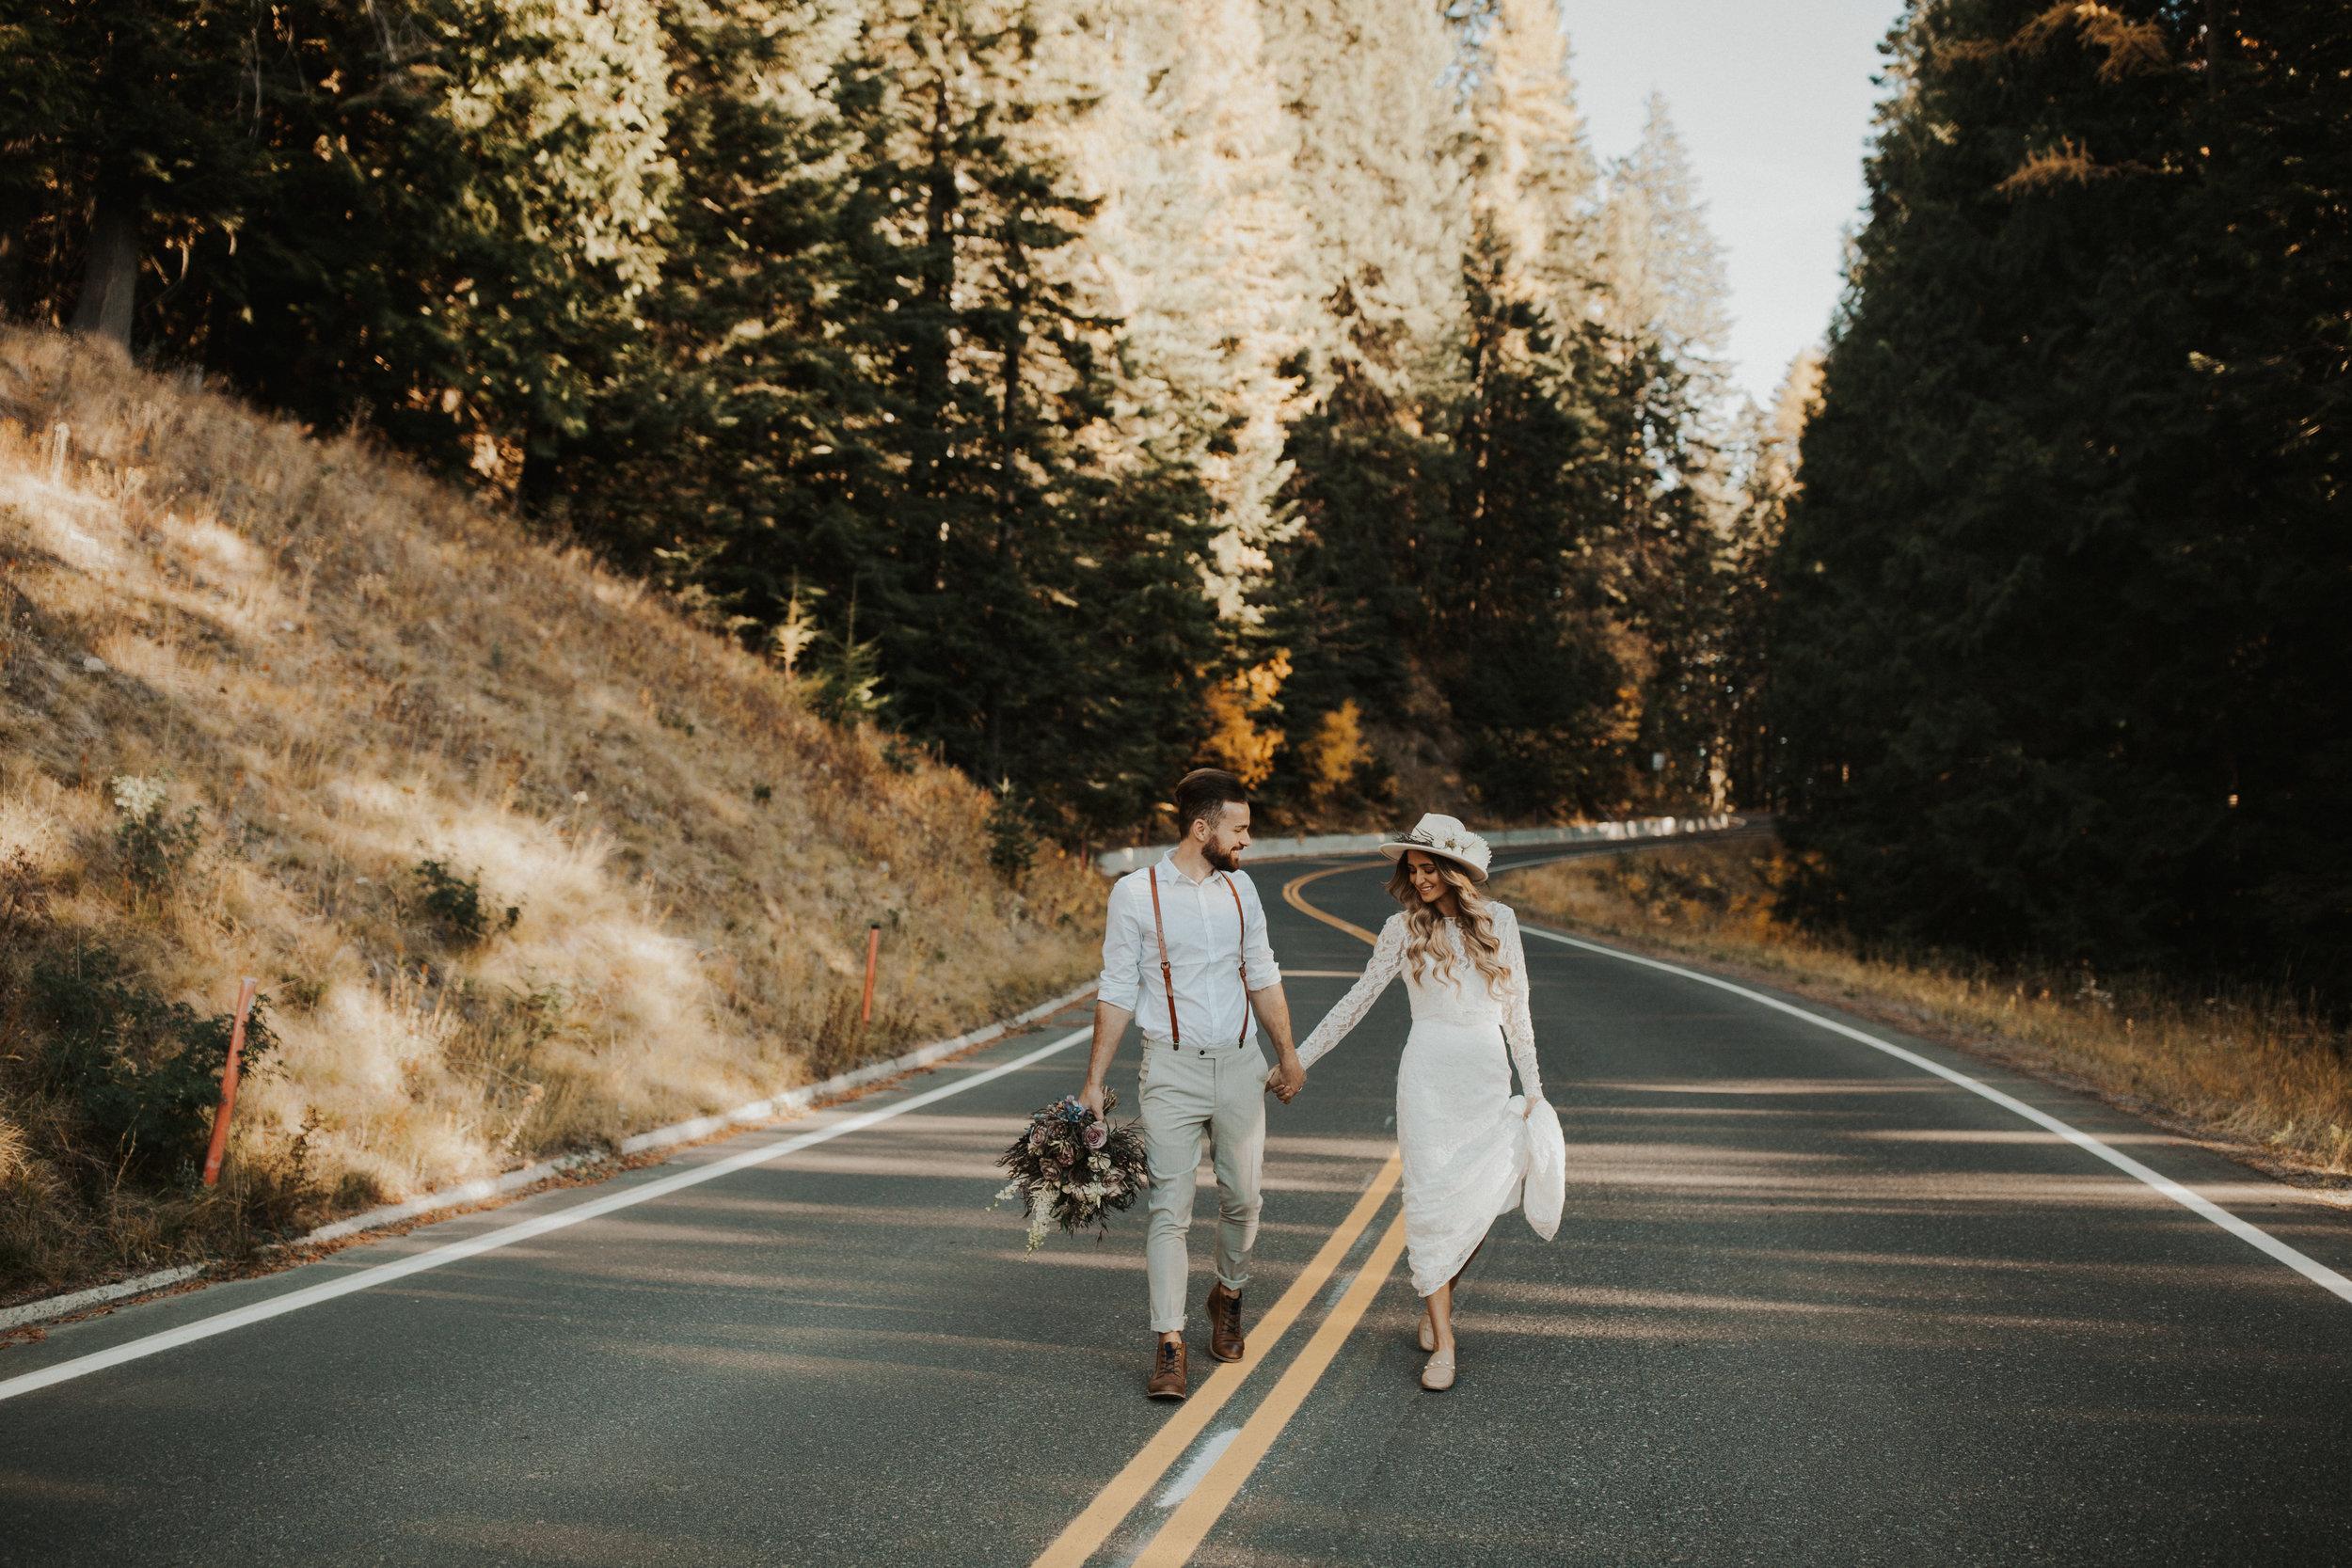 walking down the road Spokane bridal photo shoot wedding image